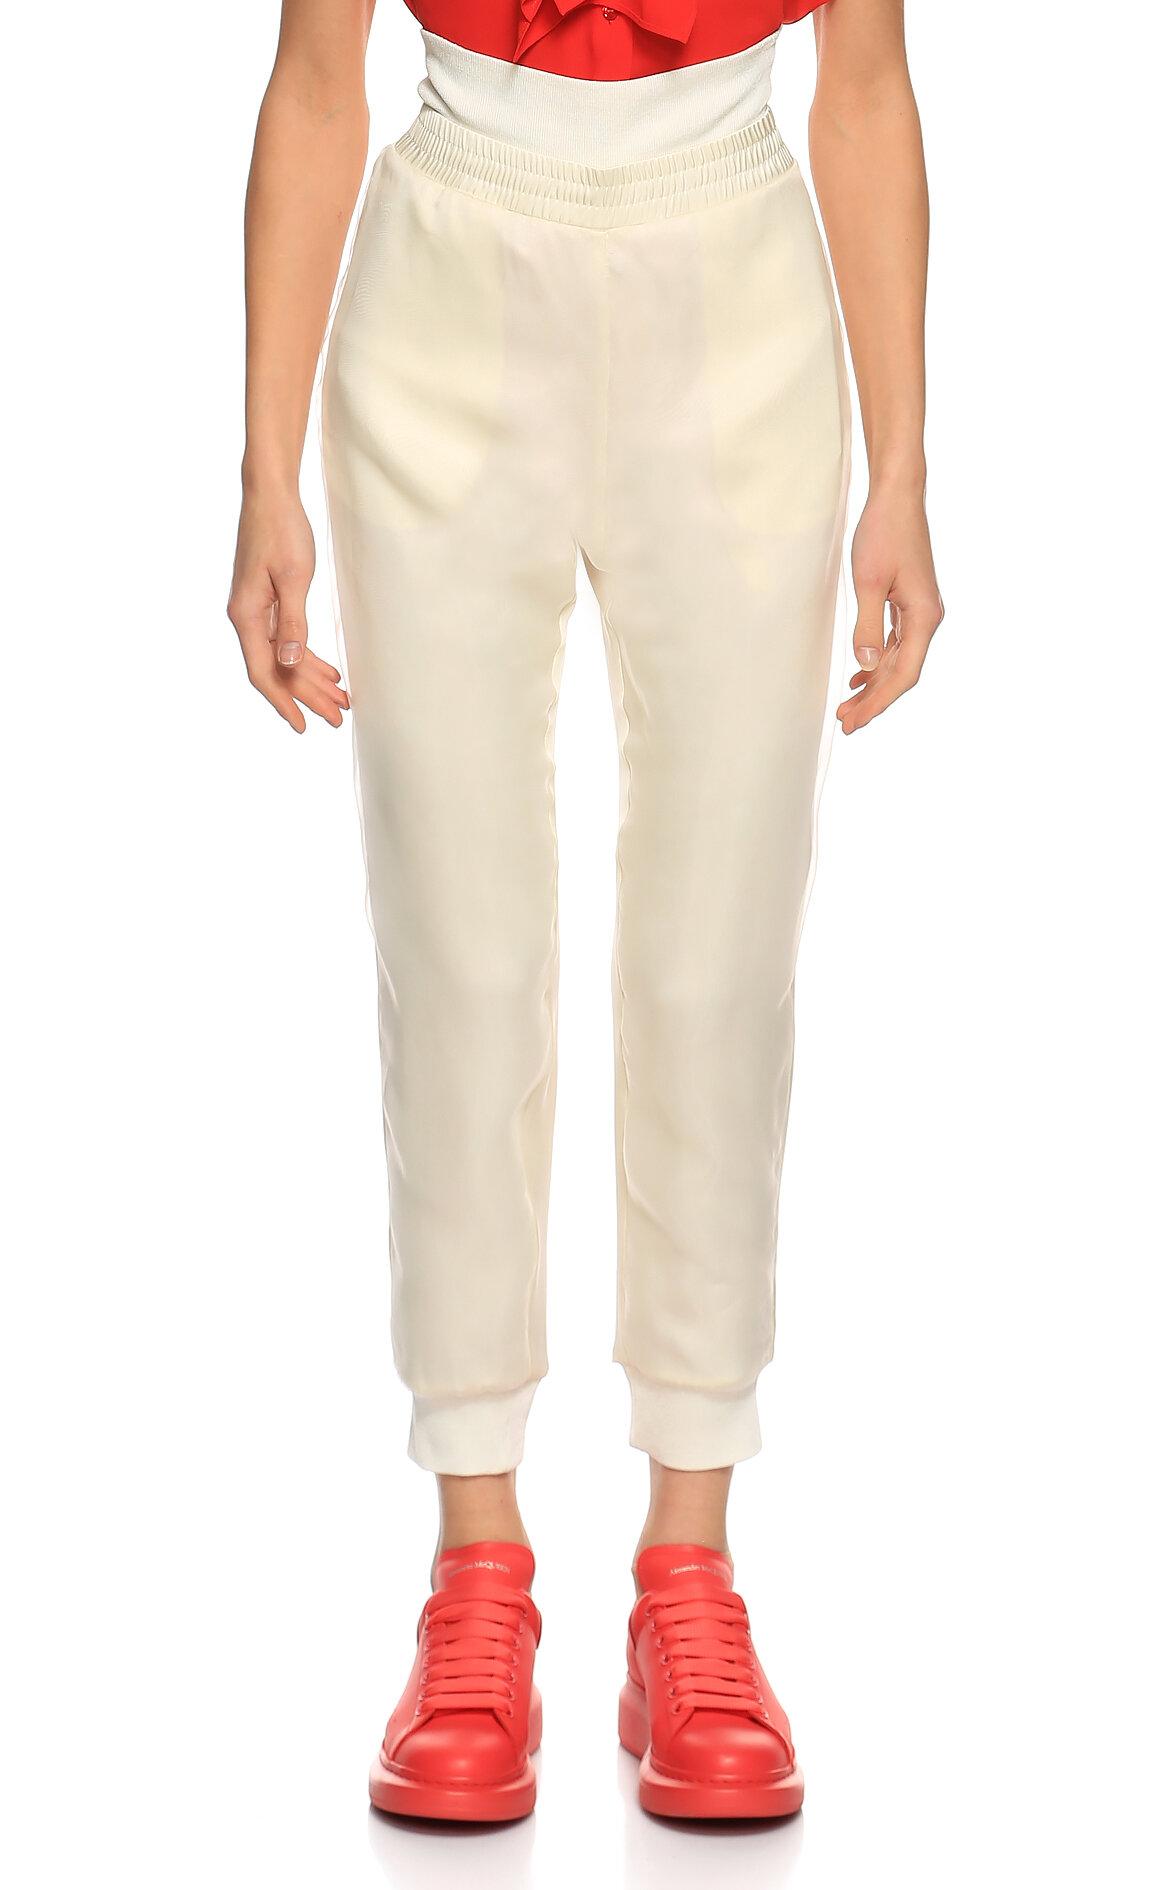 Alexander McQueen-Alexander McQueen Paçası Lastikli Pantolon